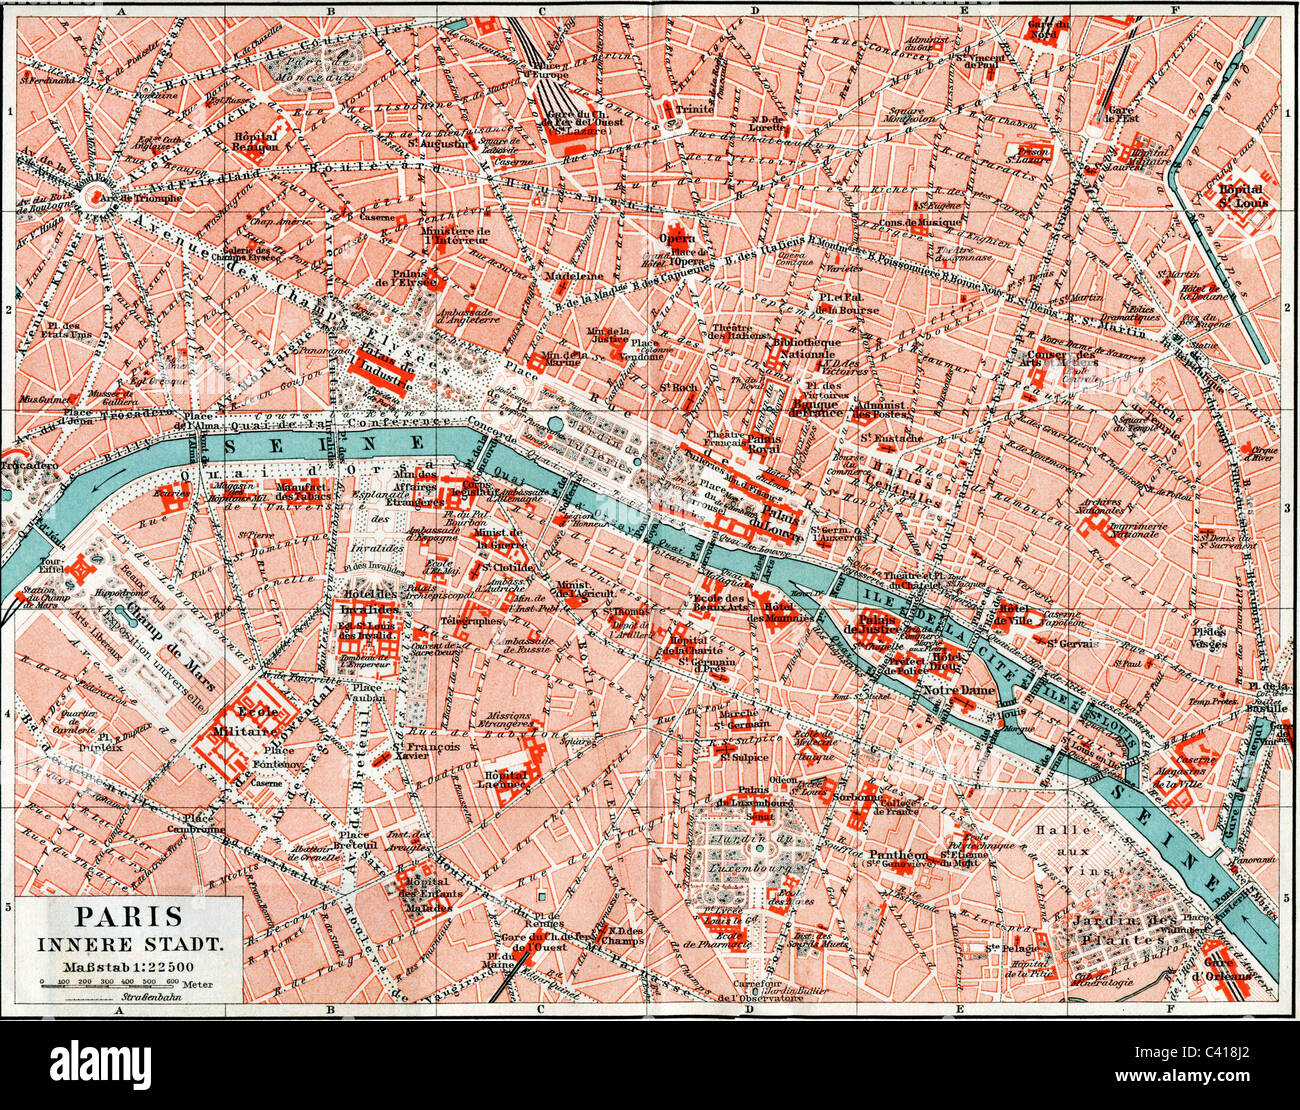 cartography city maps Paris France inner city colour lithograph